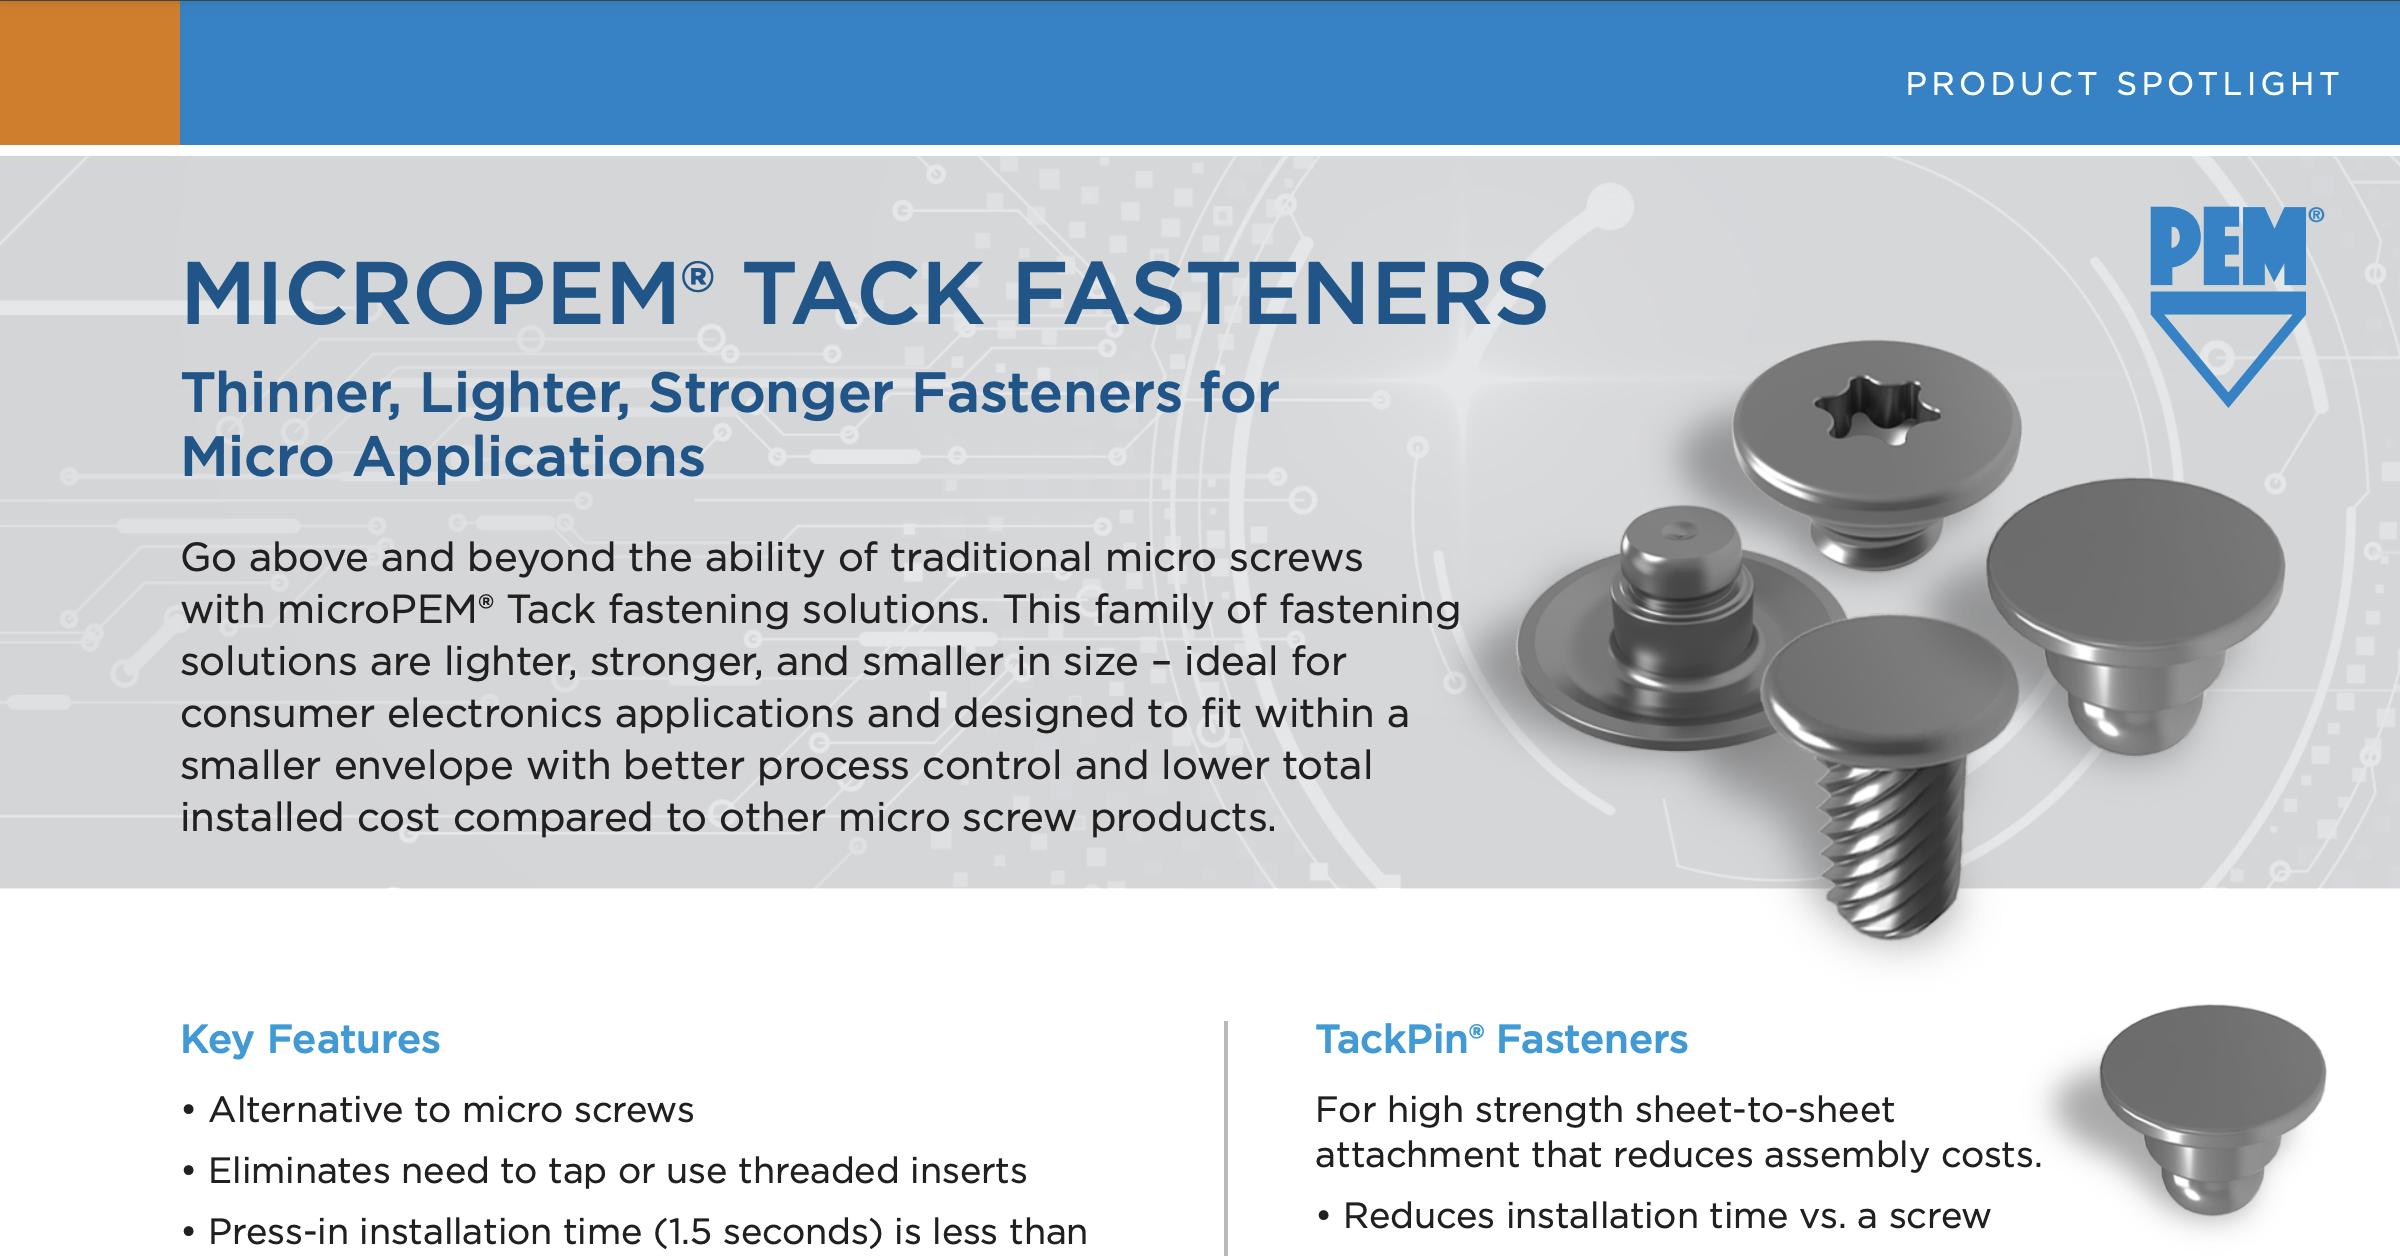 micropem tack fasteners